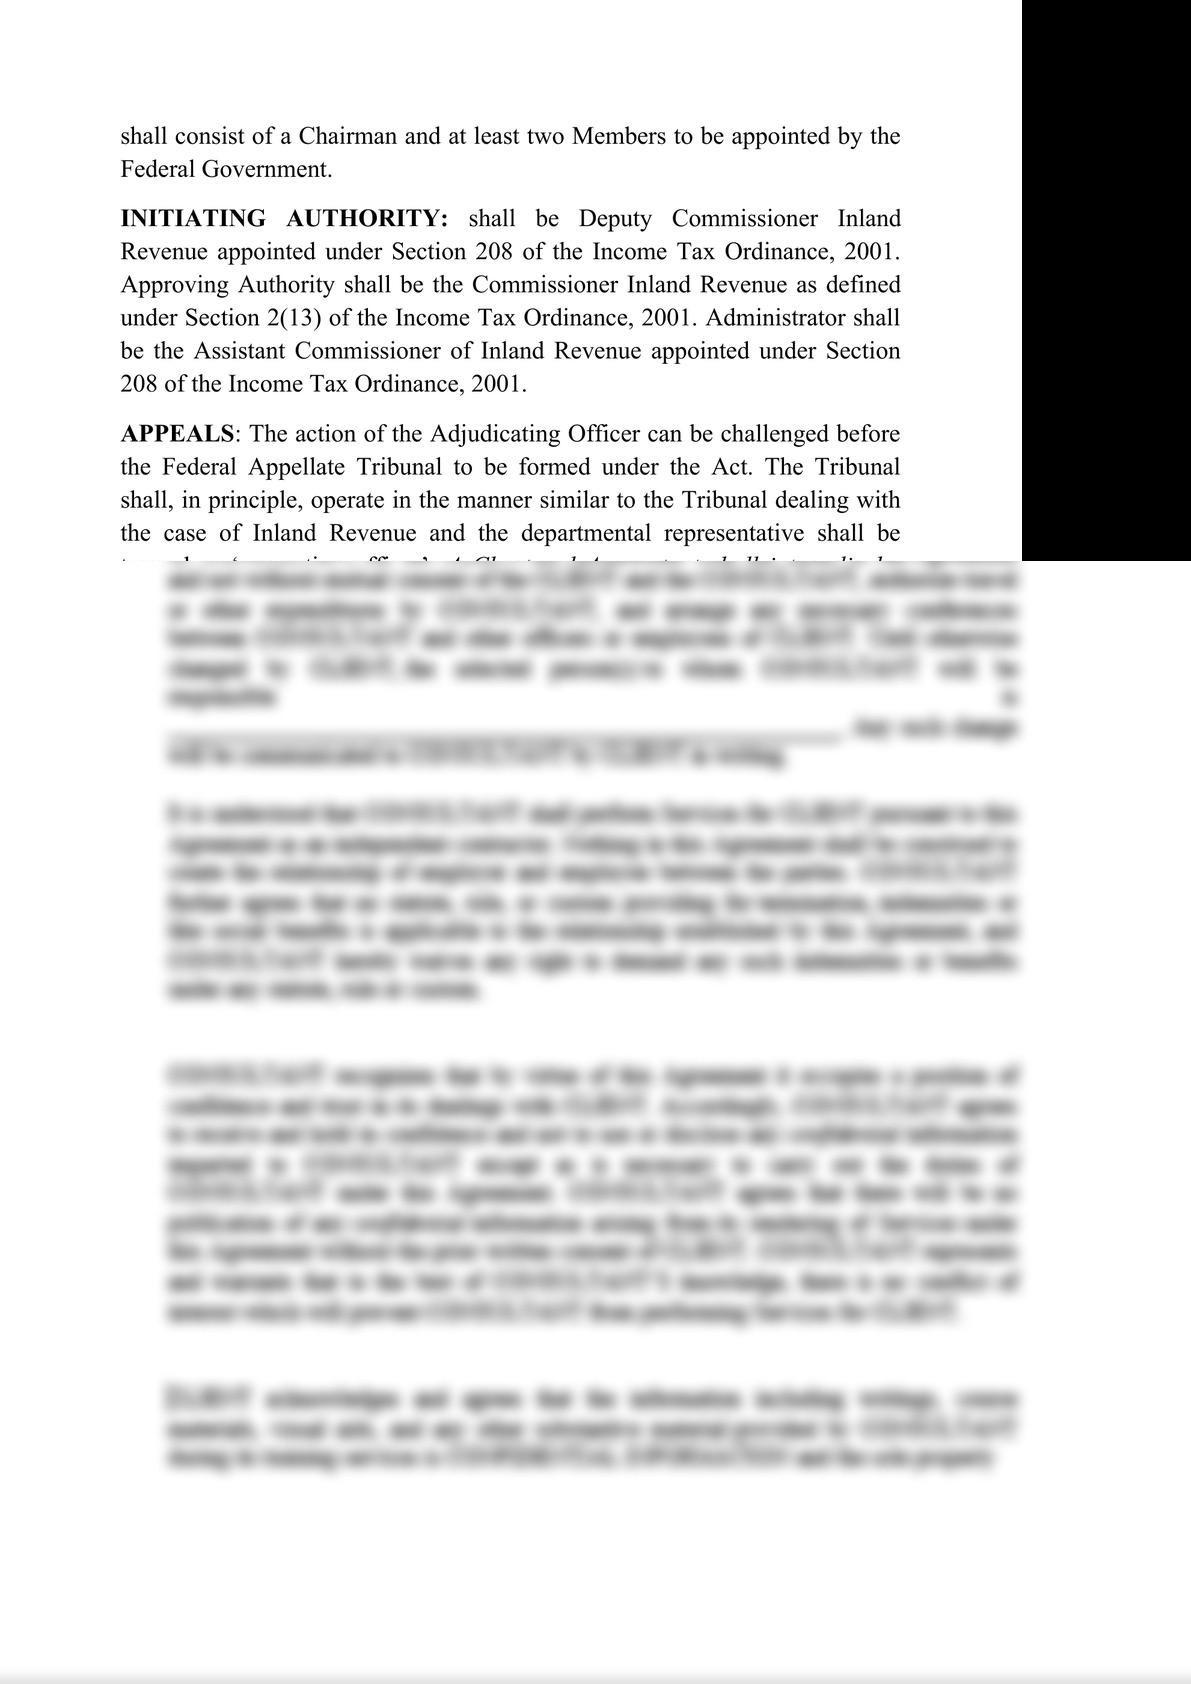 NOTES ON BENAMI TRANSACTIONS (PROHIBITION) ACT, 2017-3